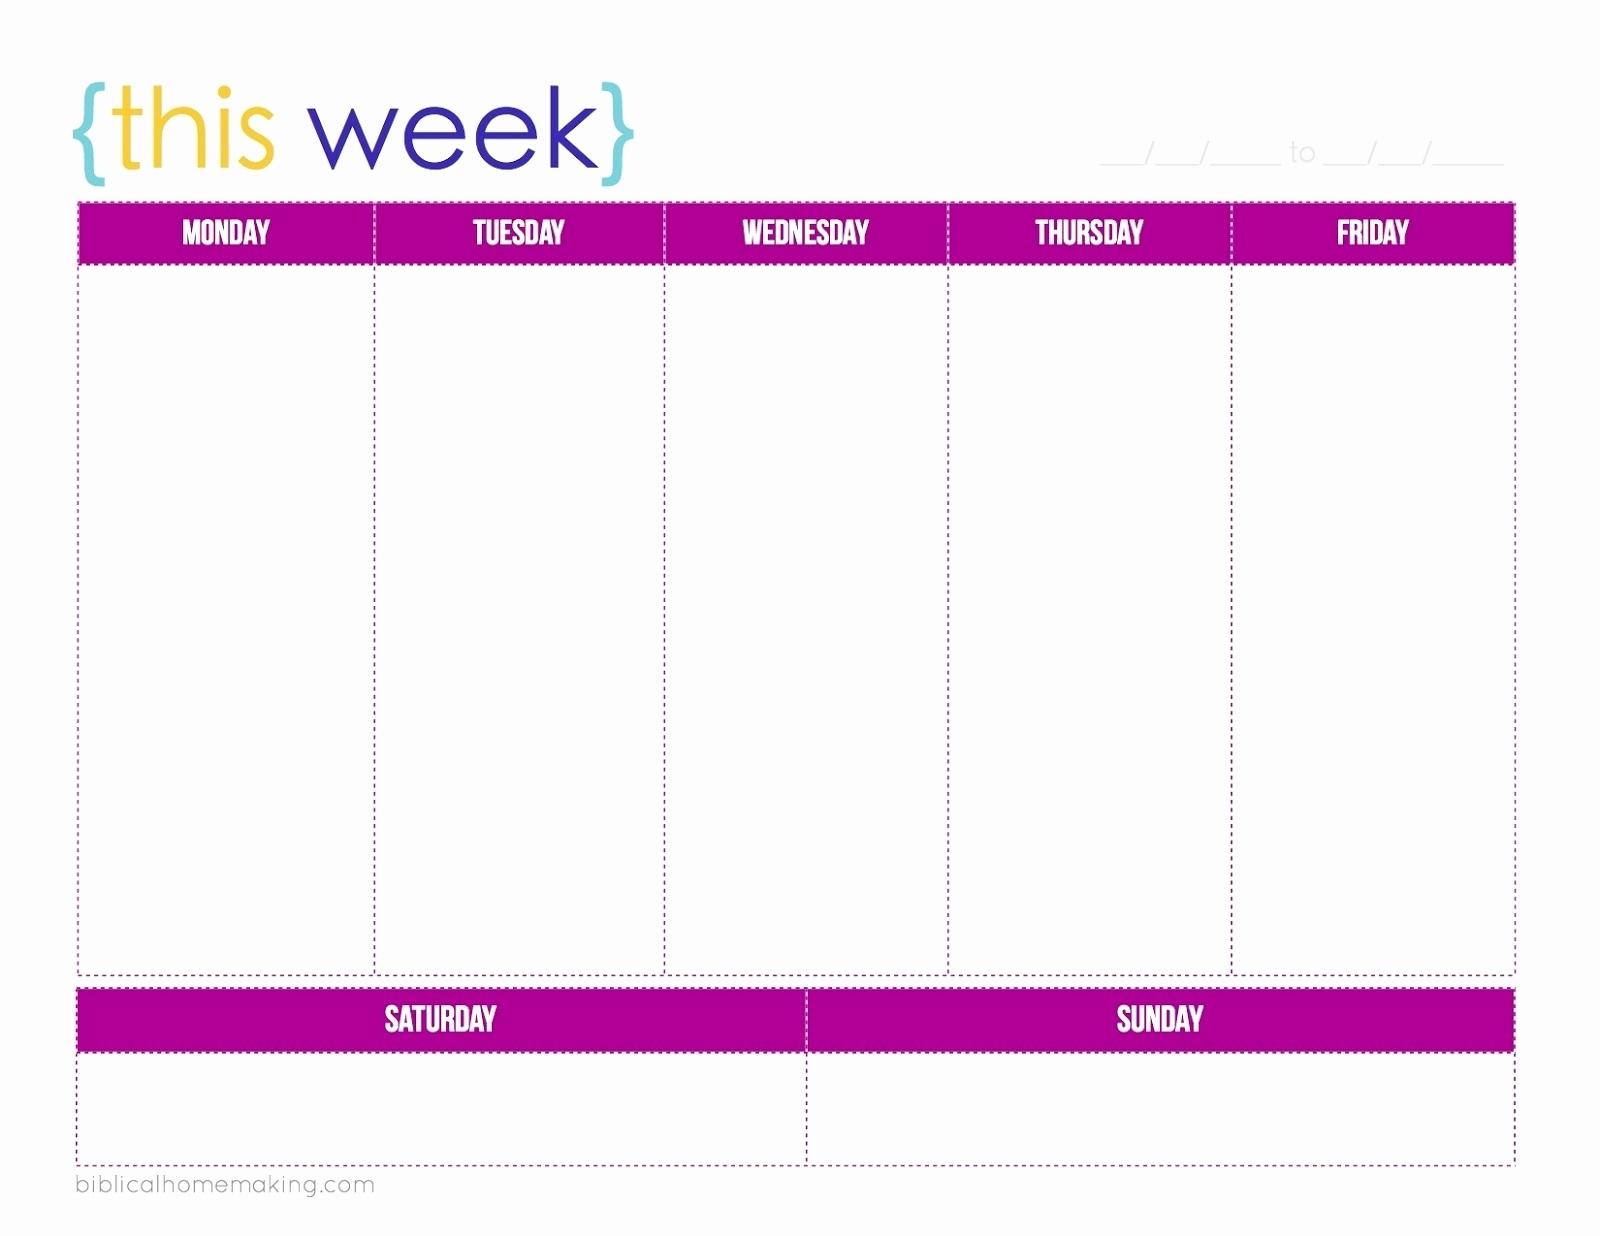 5 Day 7 Week Calendar Printable Free Monday Through Friday Schedule with Monday Through Friday Weekly Calendar